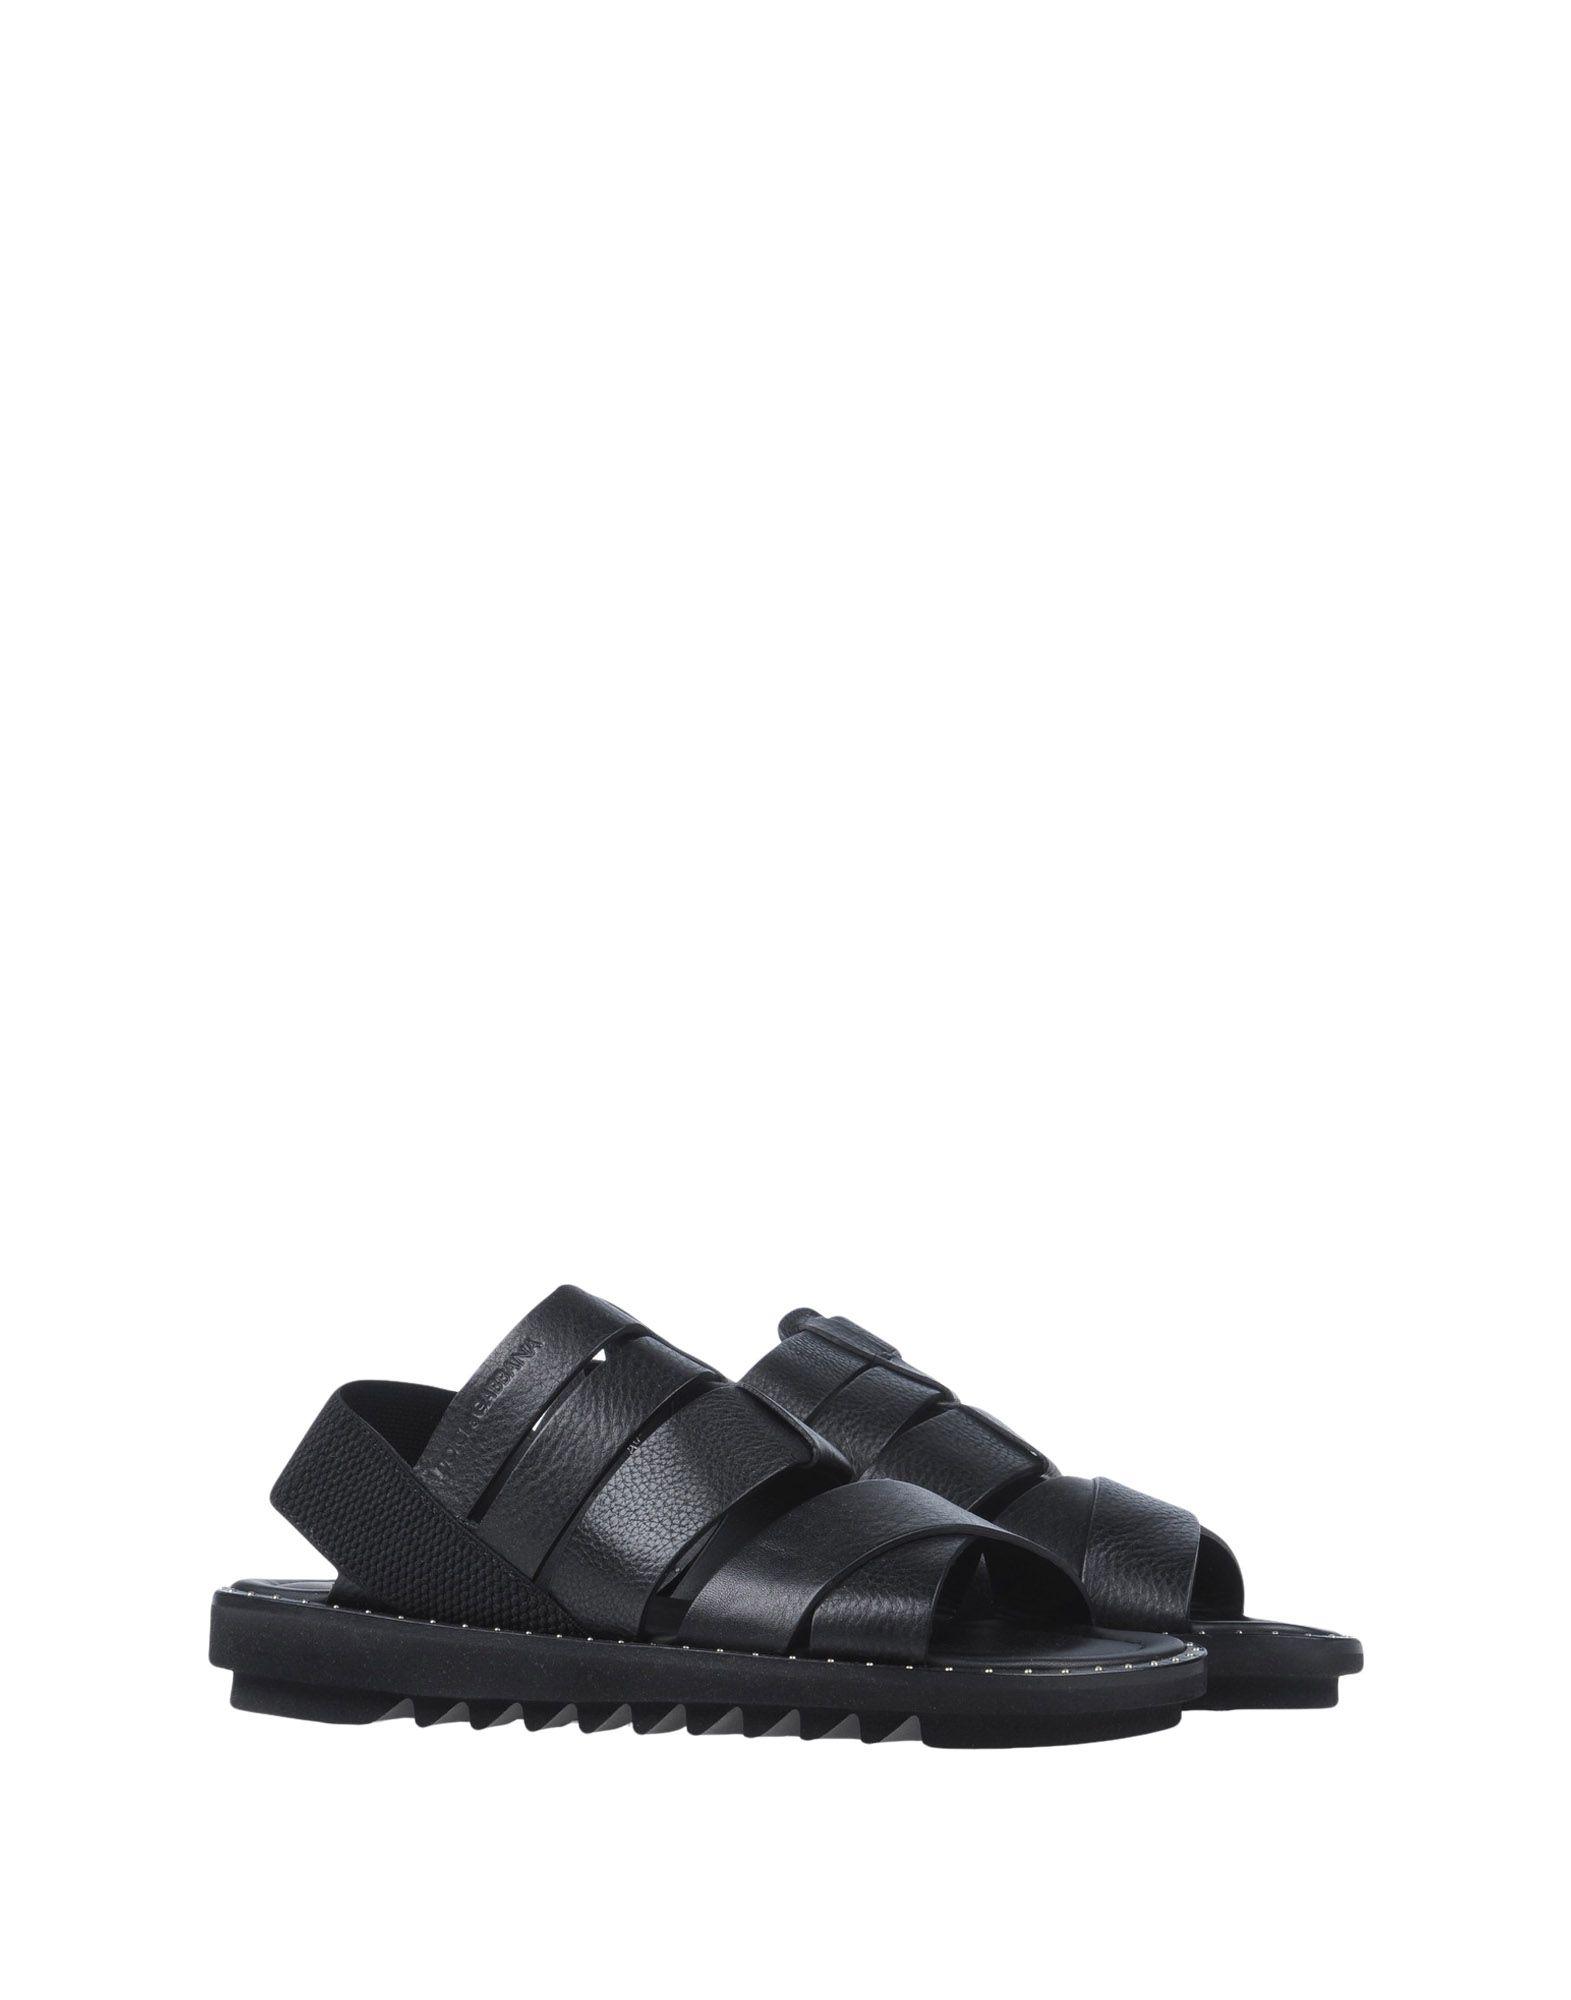 Sandales Dolce & Gabbana Homme - Sandales Dolce & Gabbana sur